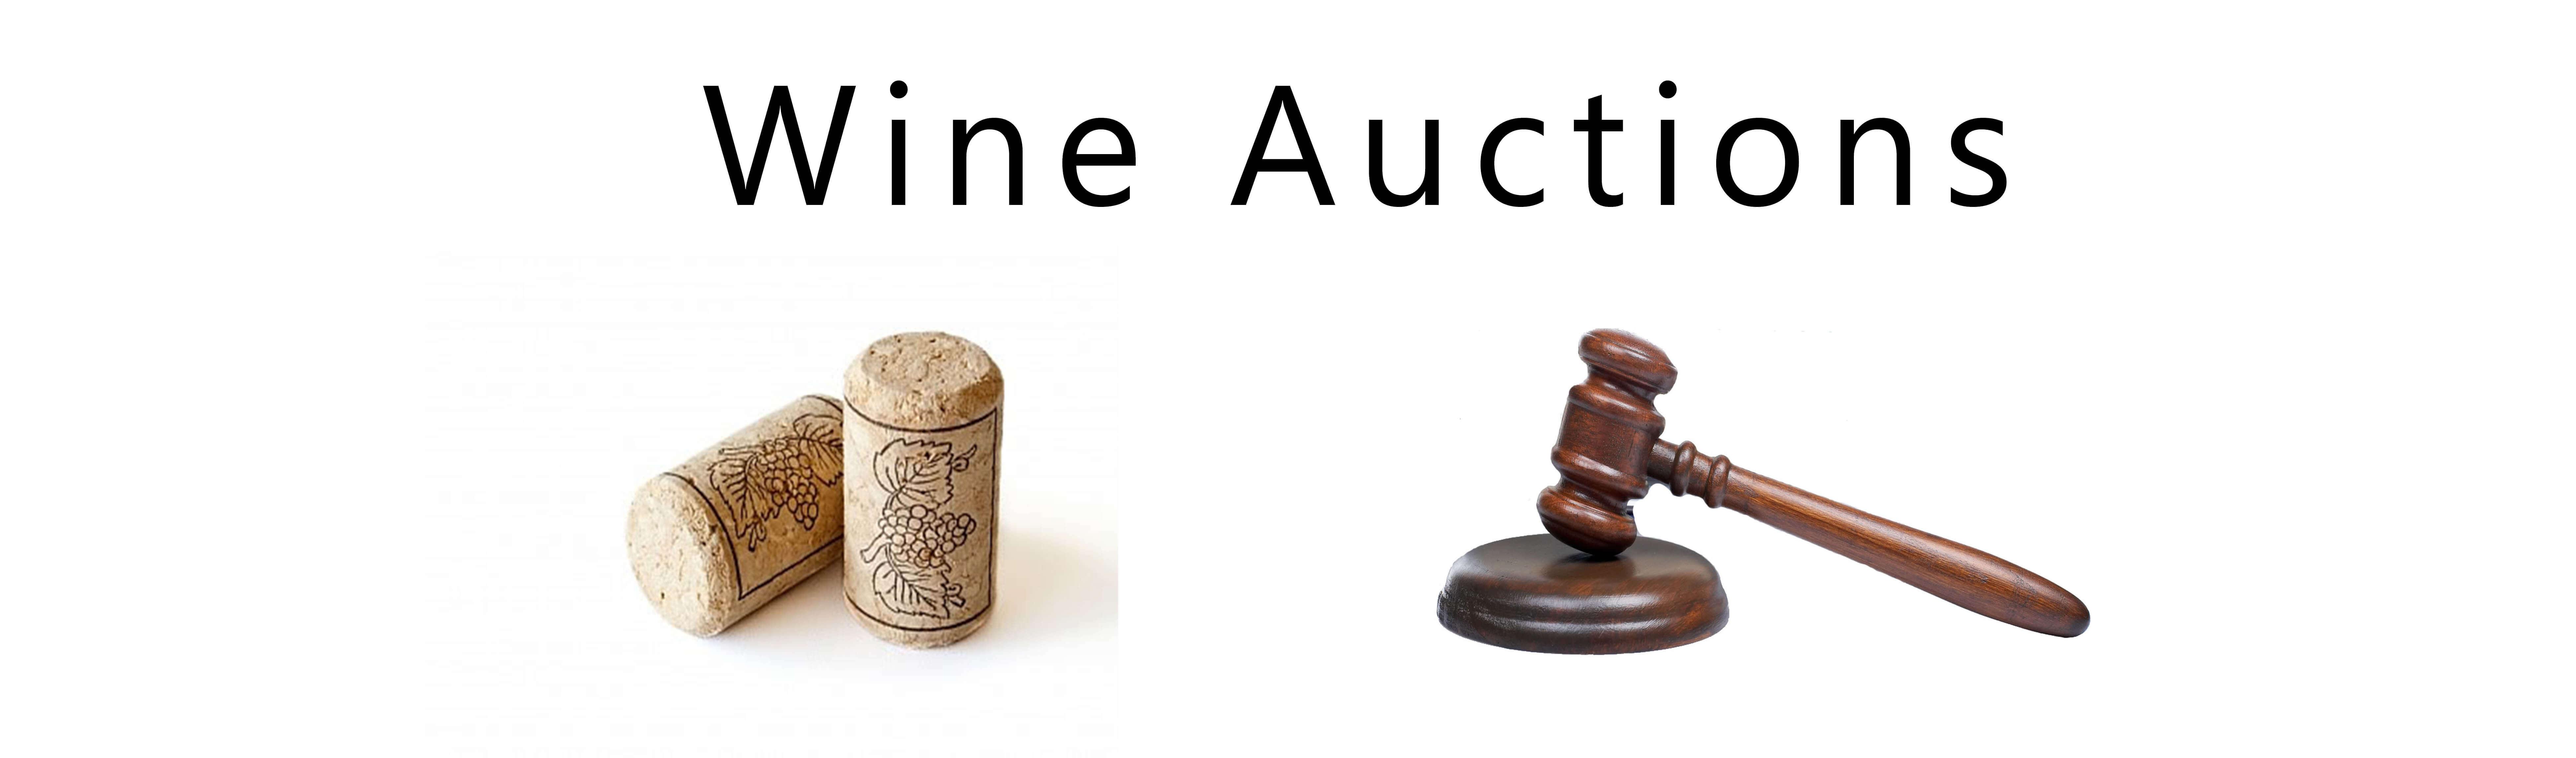 wine-auction-banner